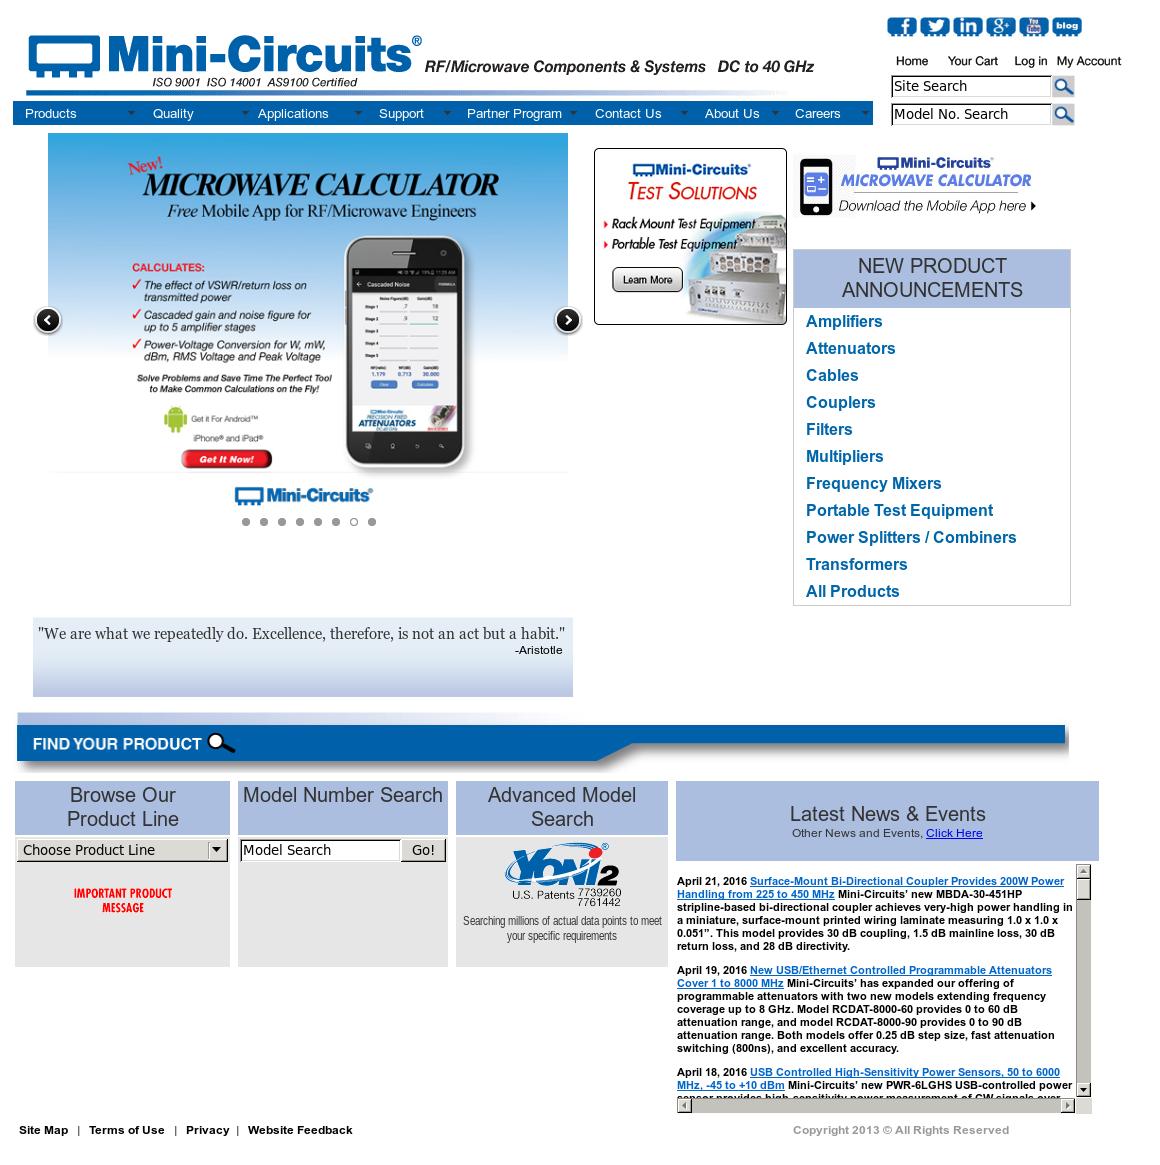 Mini-Circuits Competitors, Revenue and Employees - Owler Company Profile